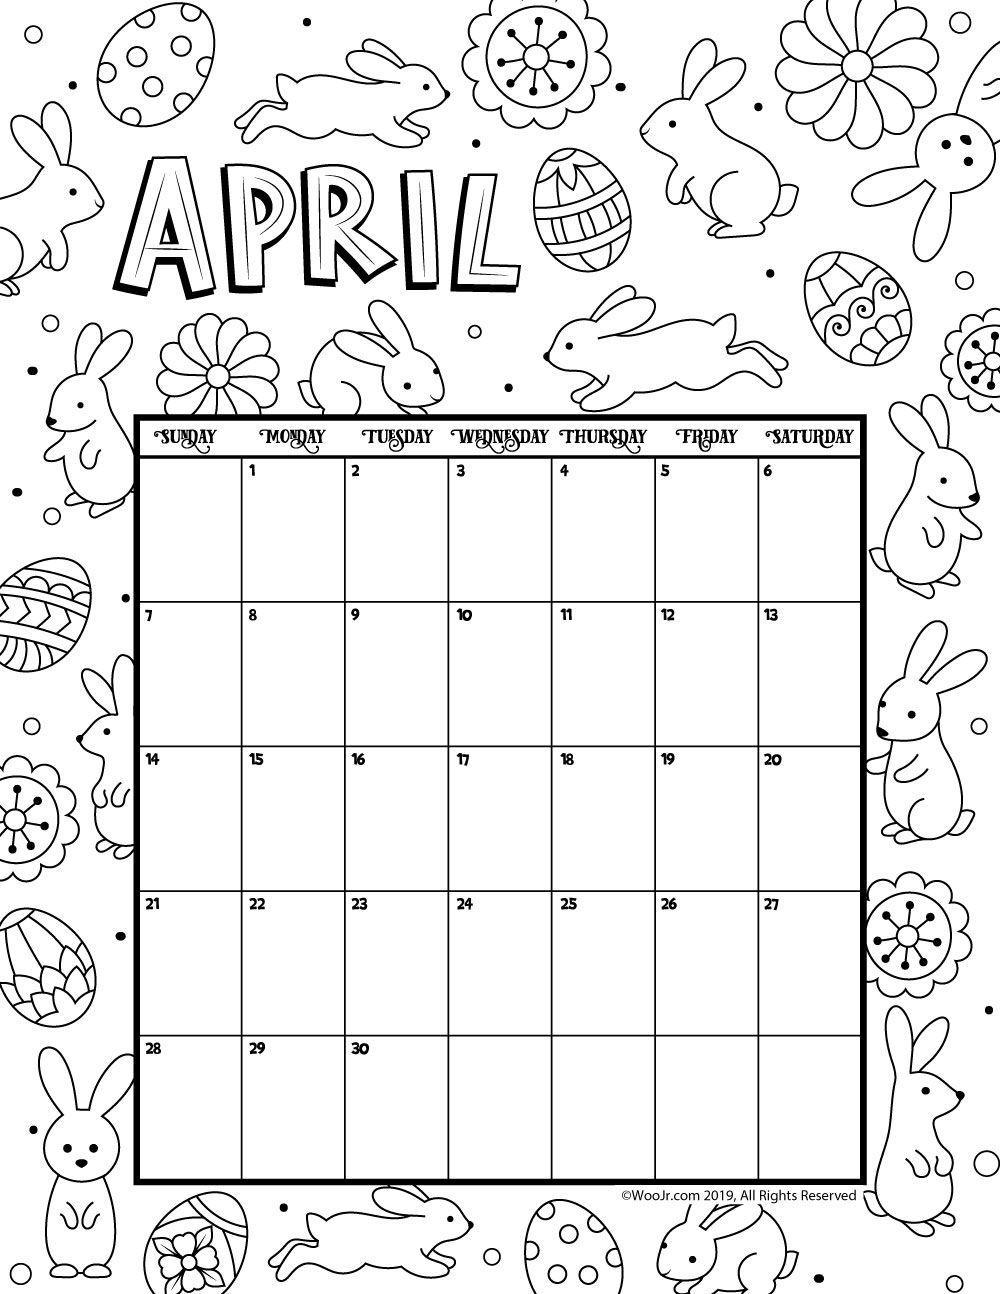 April 2019 Coloring Calendar Kids Calendar Calendar Pages Calendar